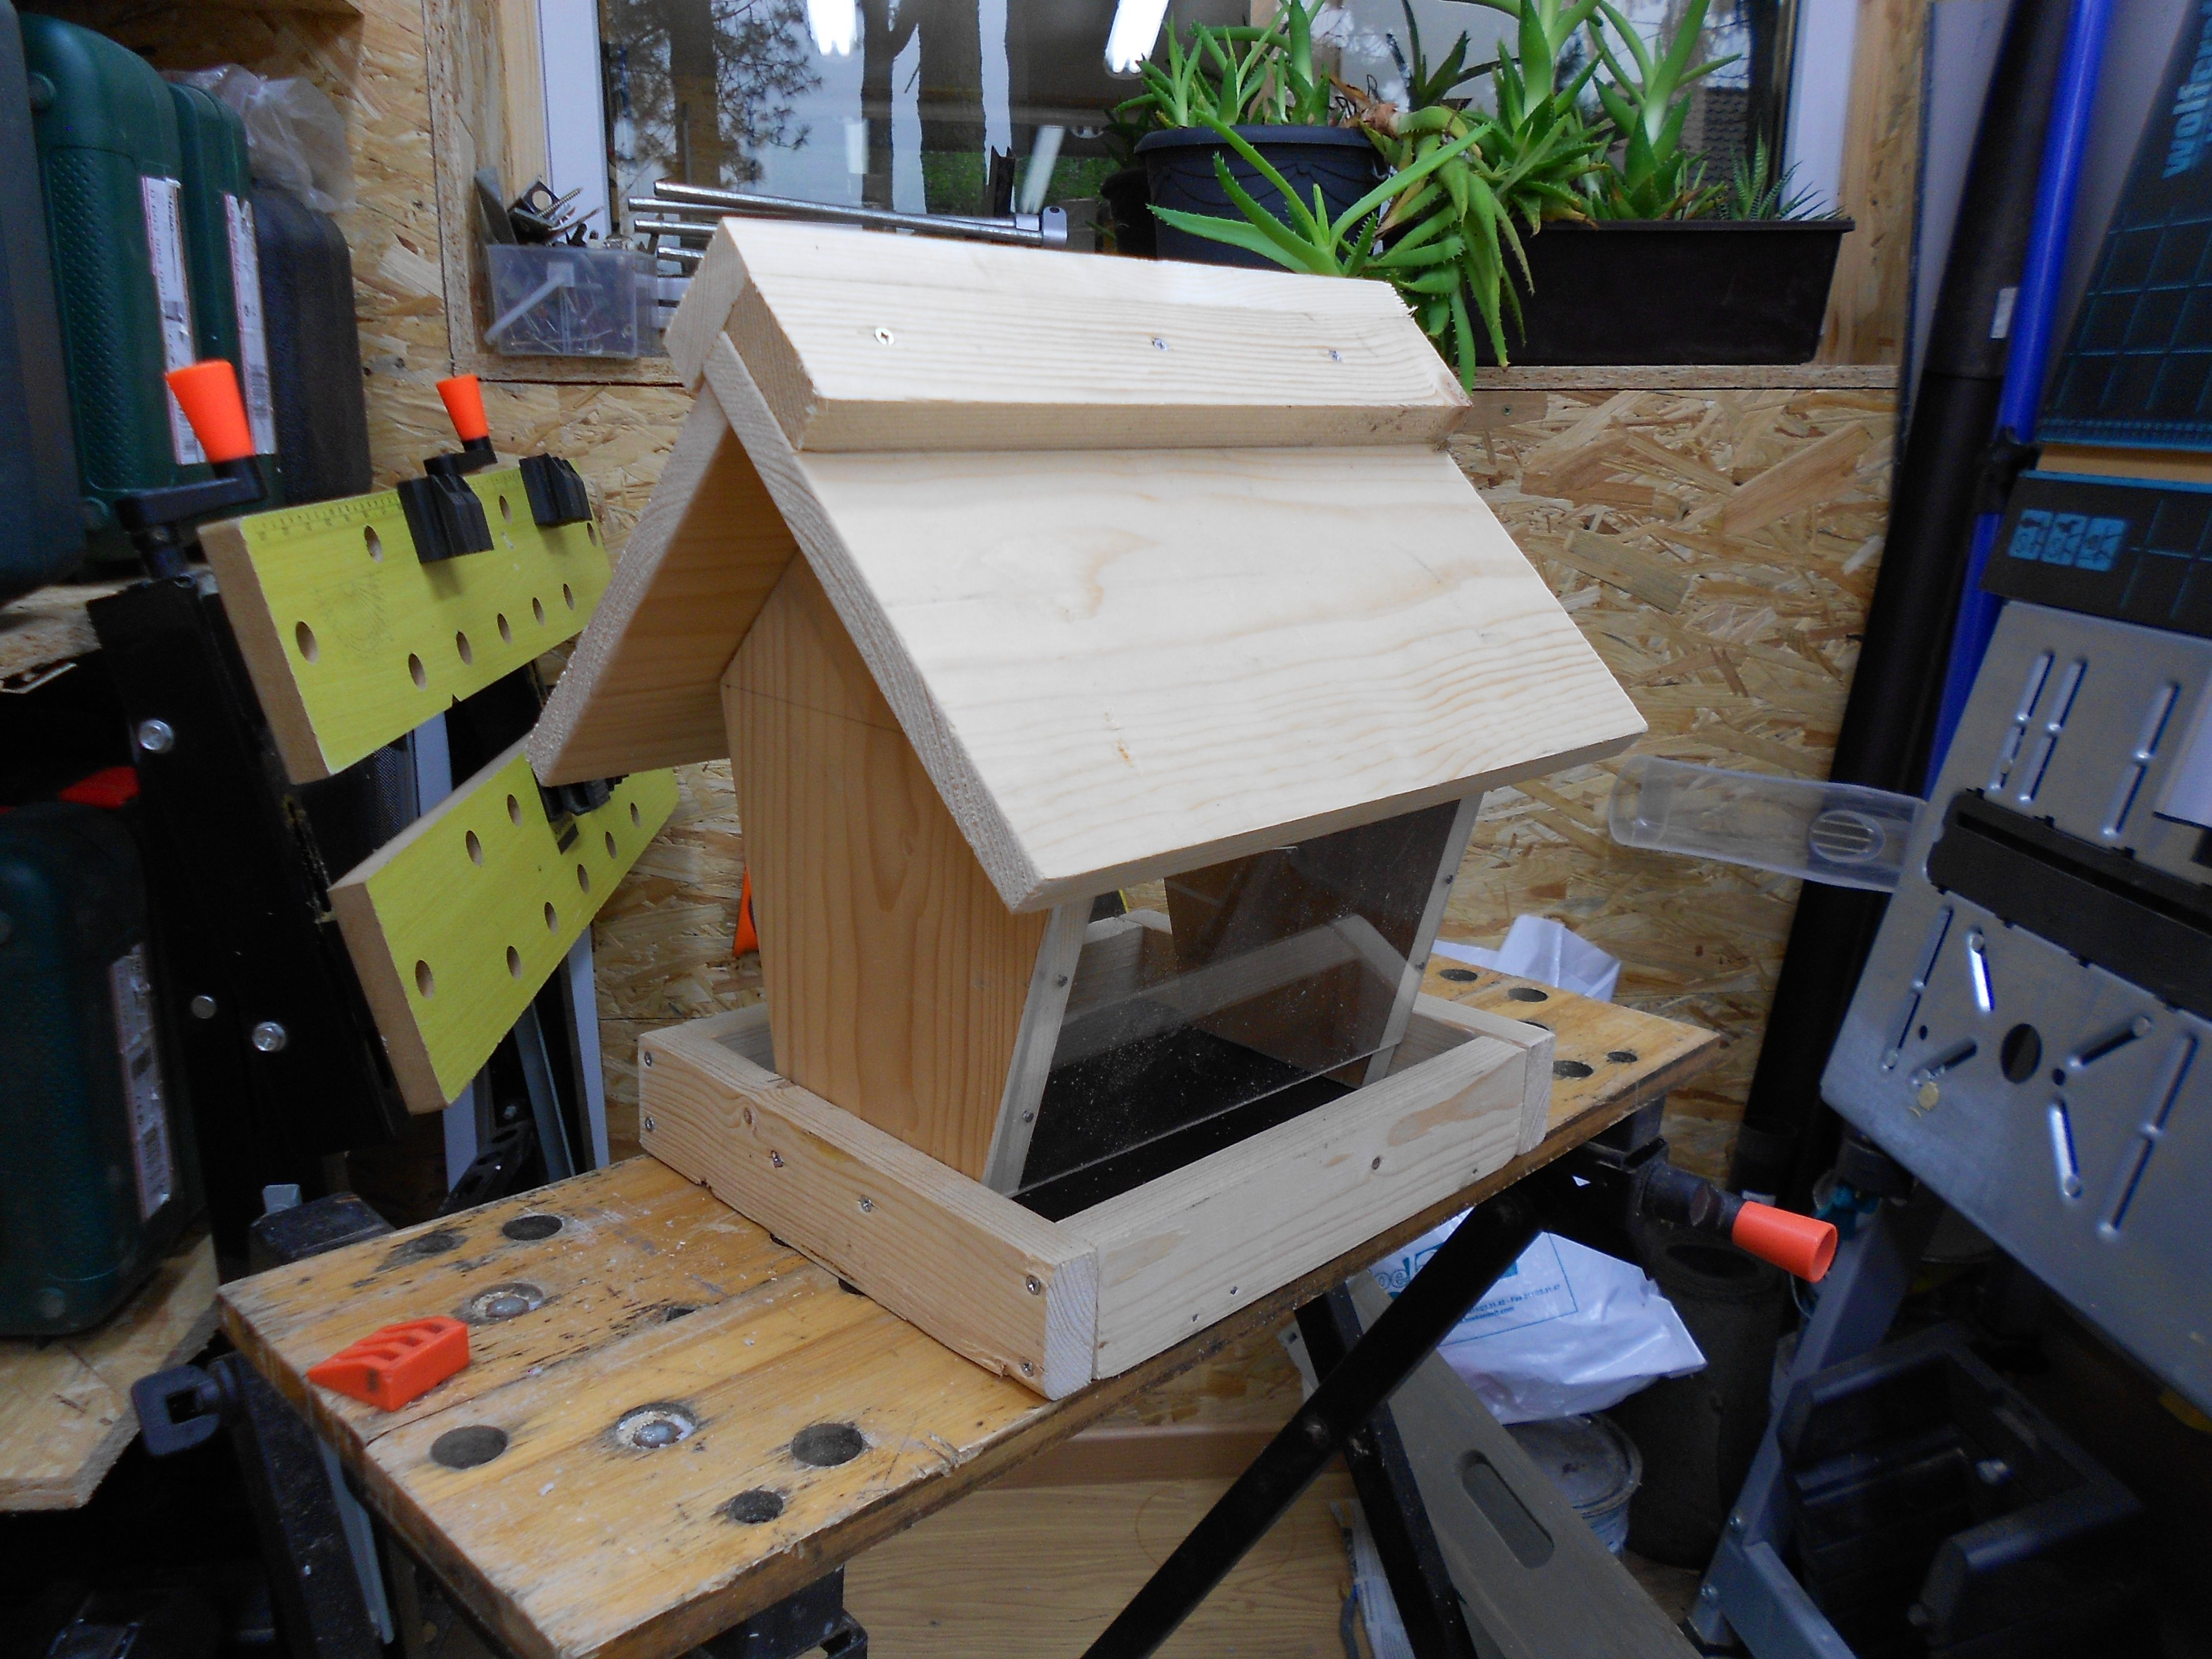 vogelfutterhaus bauanleitung zum selber bauen heimwerker. Black Bedroom Furniture Sets. Home Design Ideas